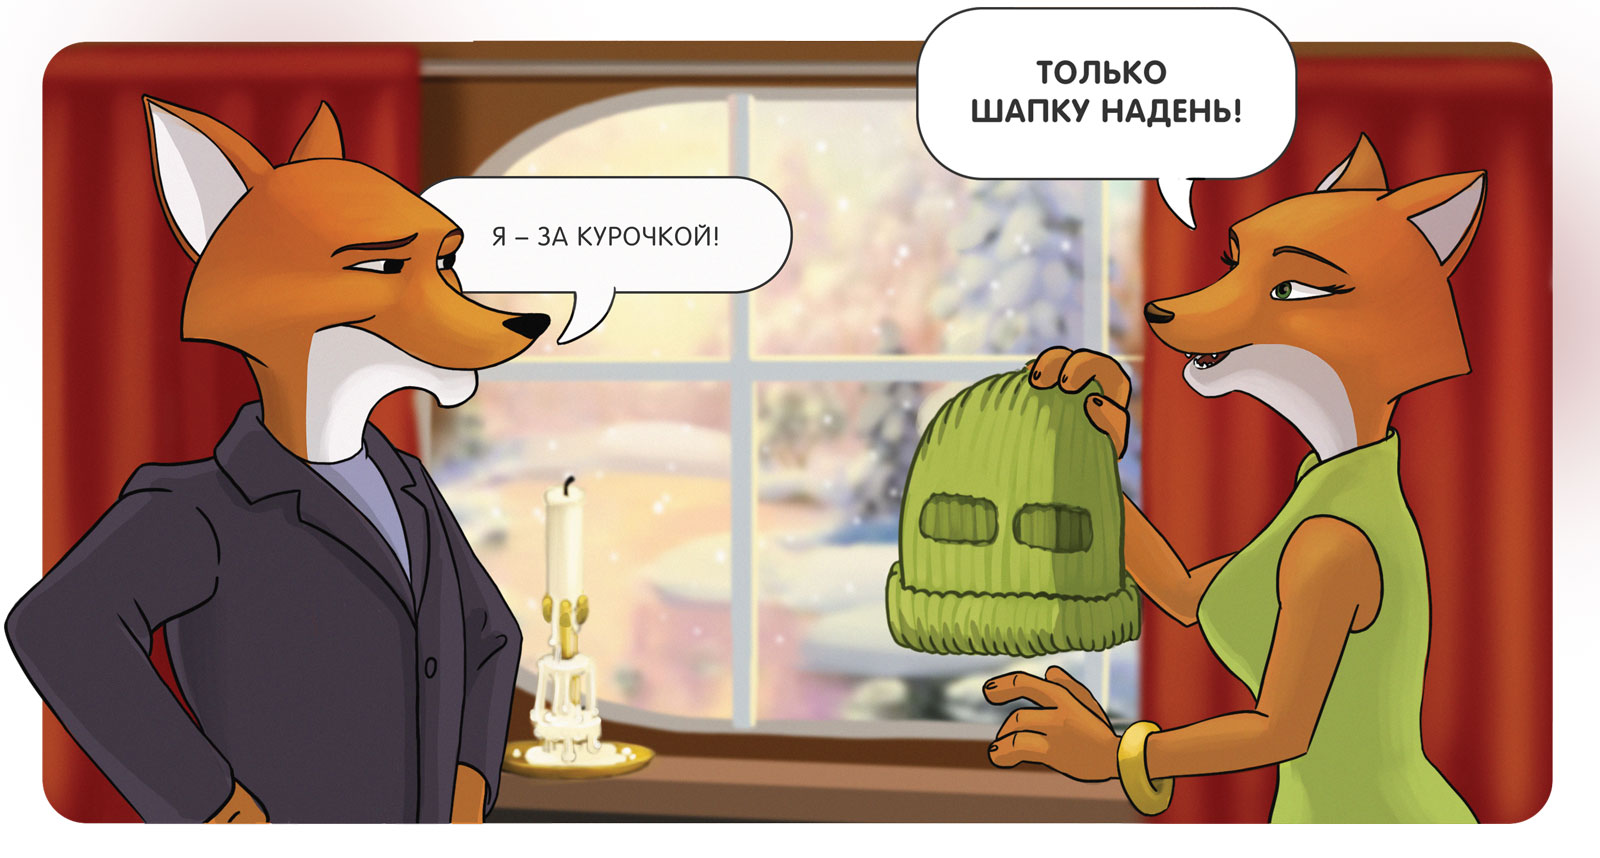 12_december_Troekurovo_smartians